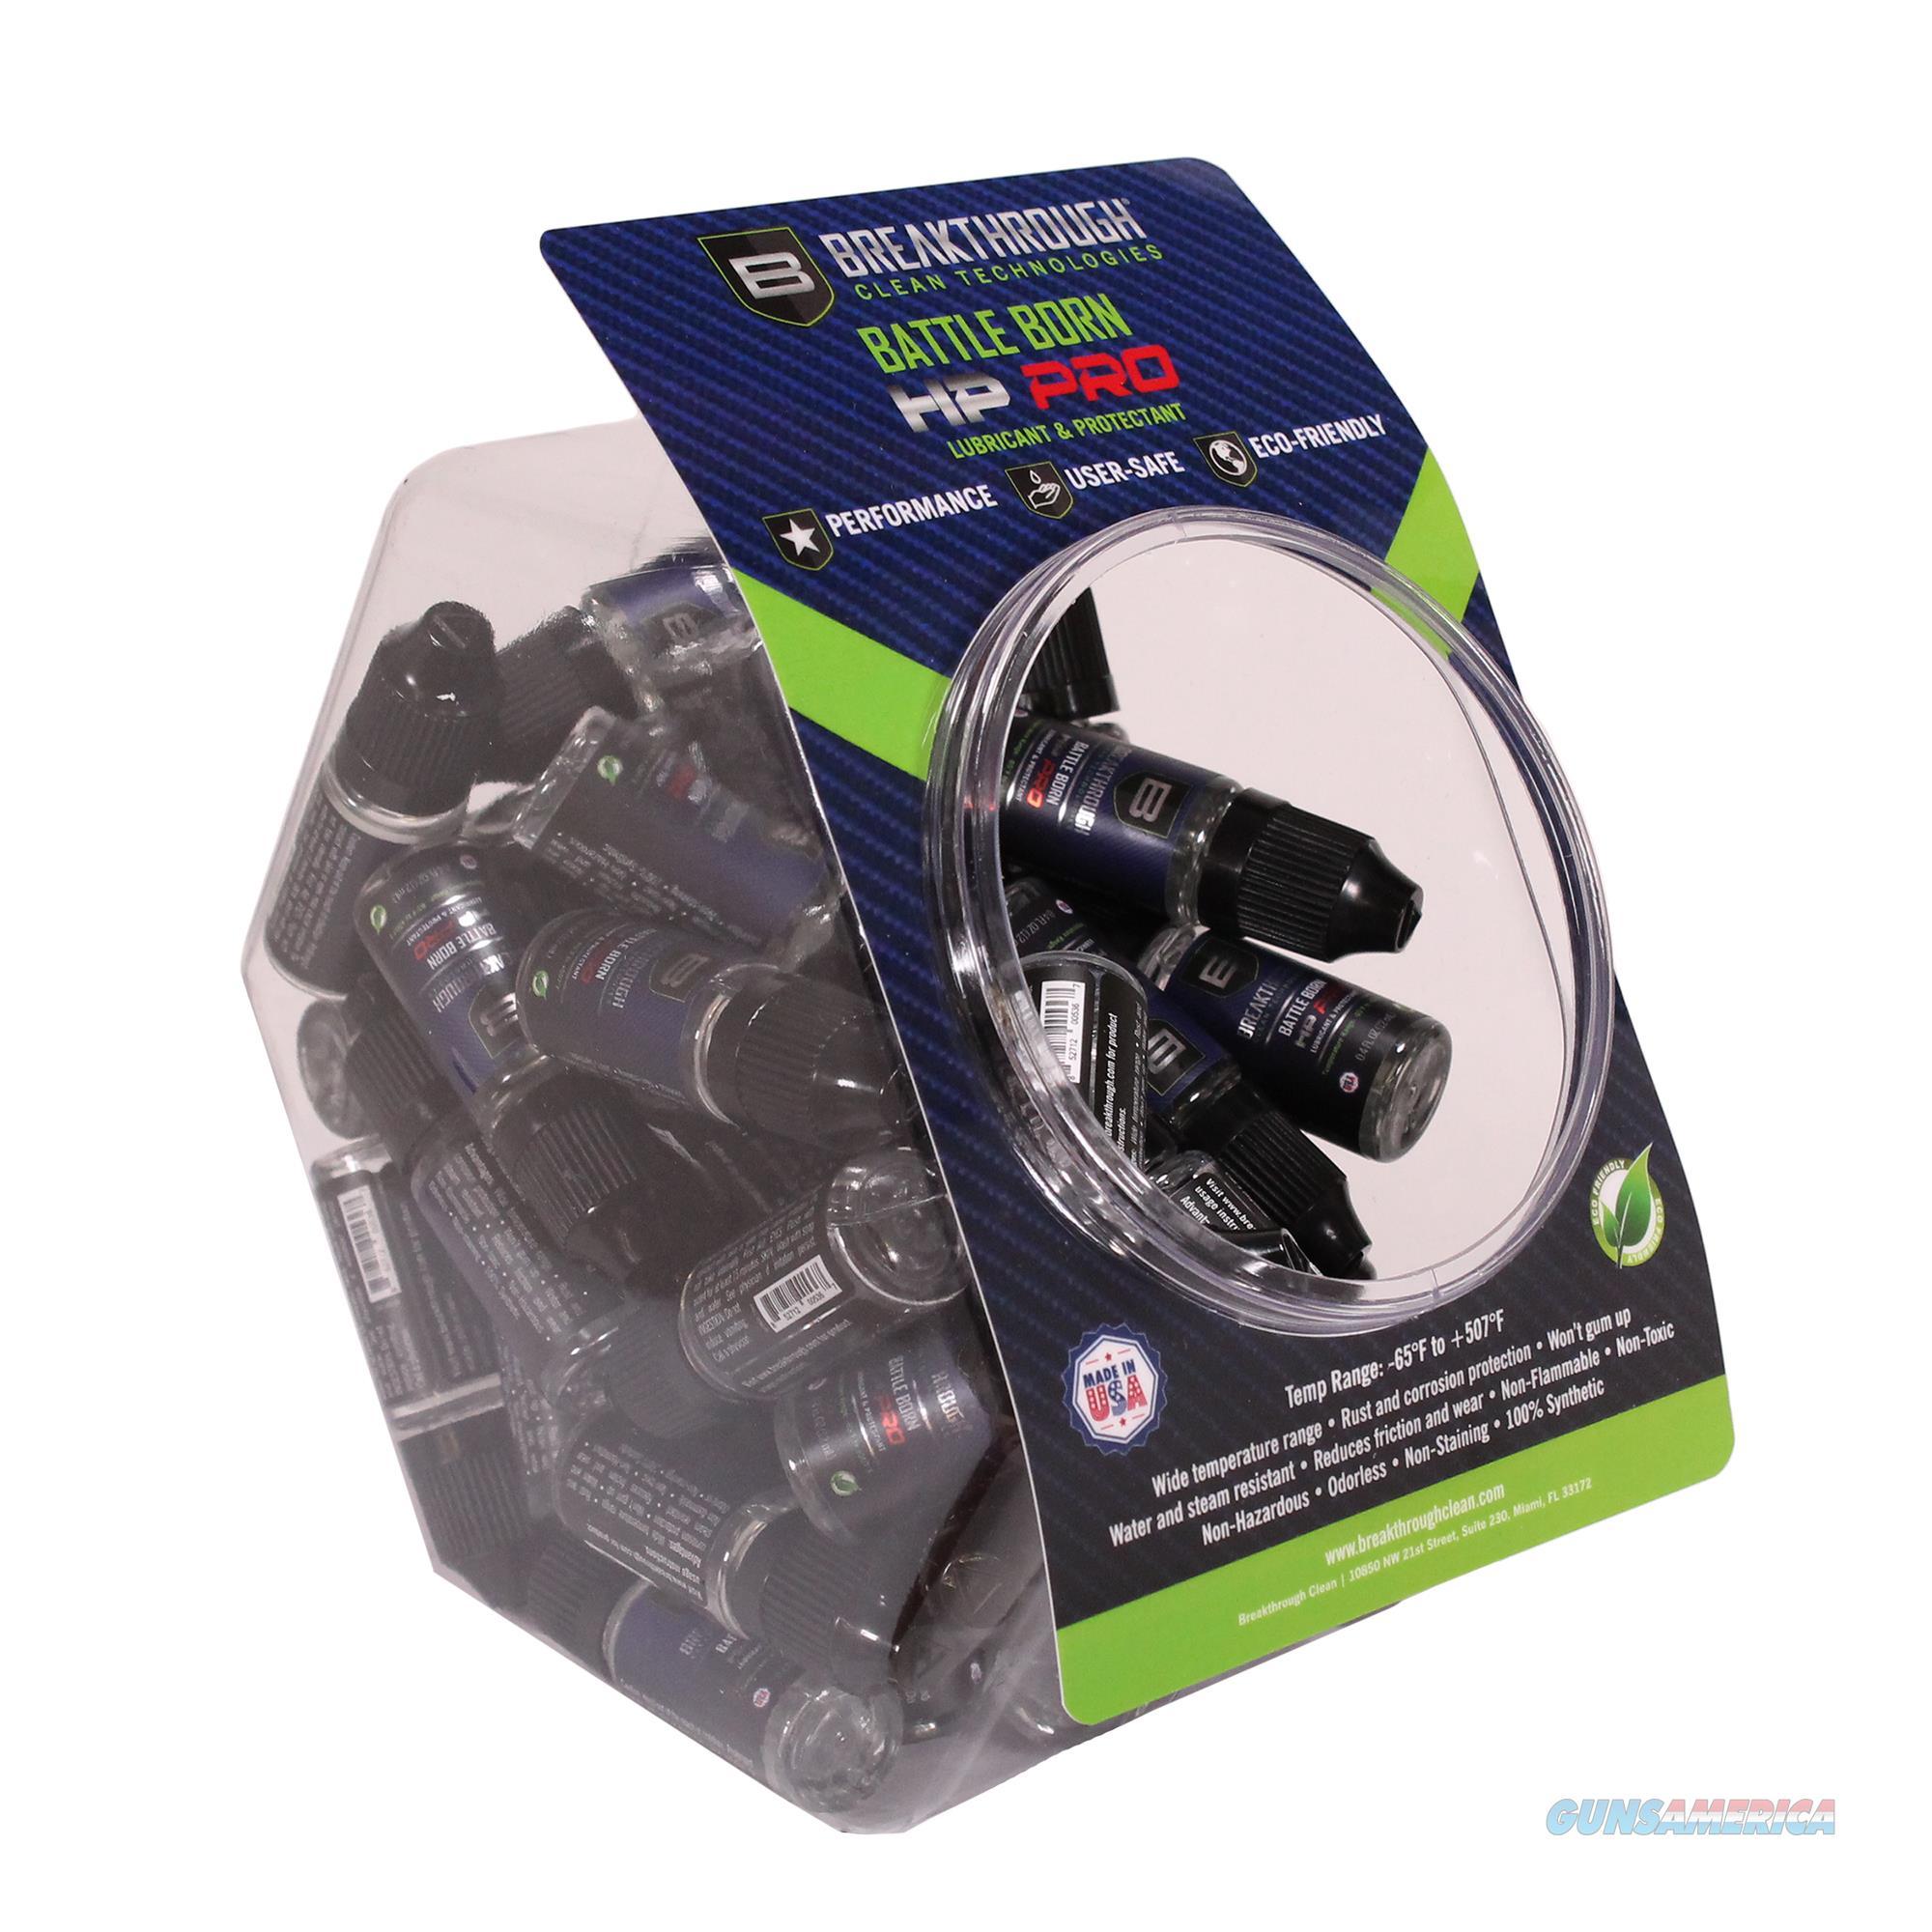 Breakthrough Clean Battle Born Hp Pro Oil HPPRO-12ML/HEX  Non-Guns > Gunsmith Tools/Supplies